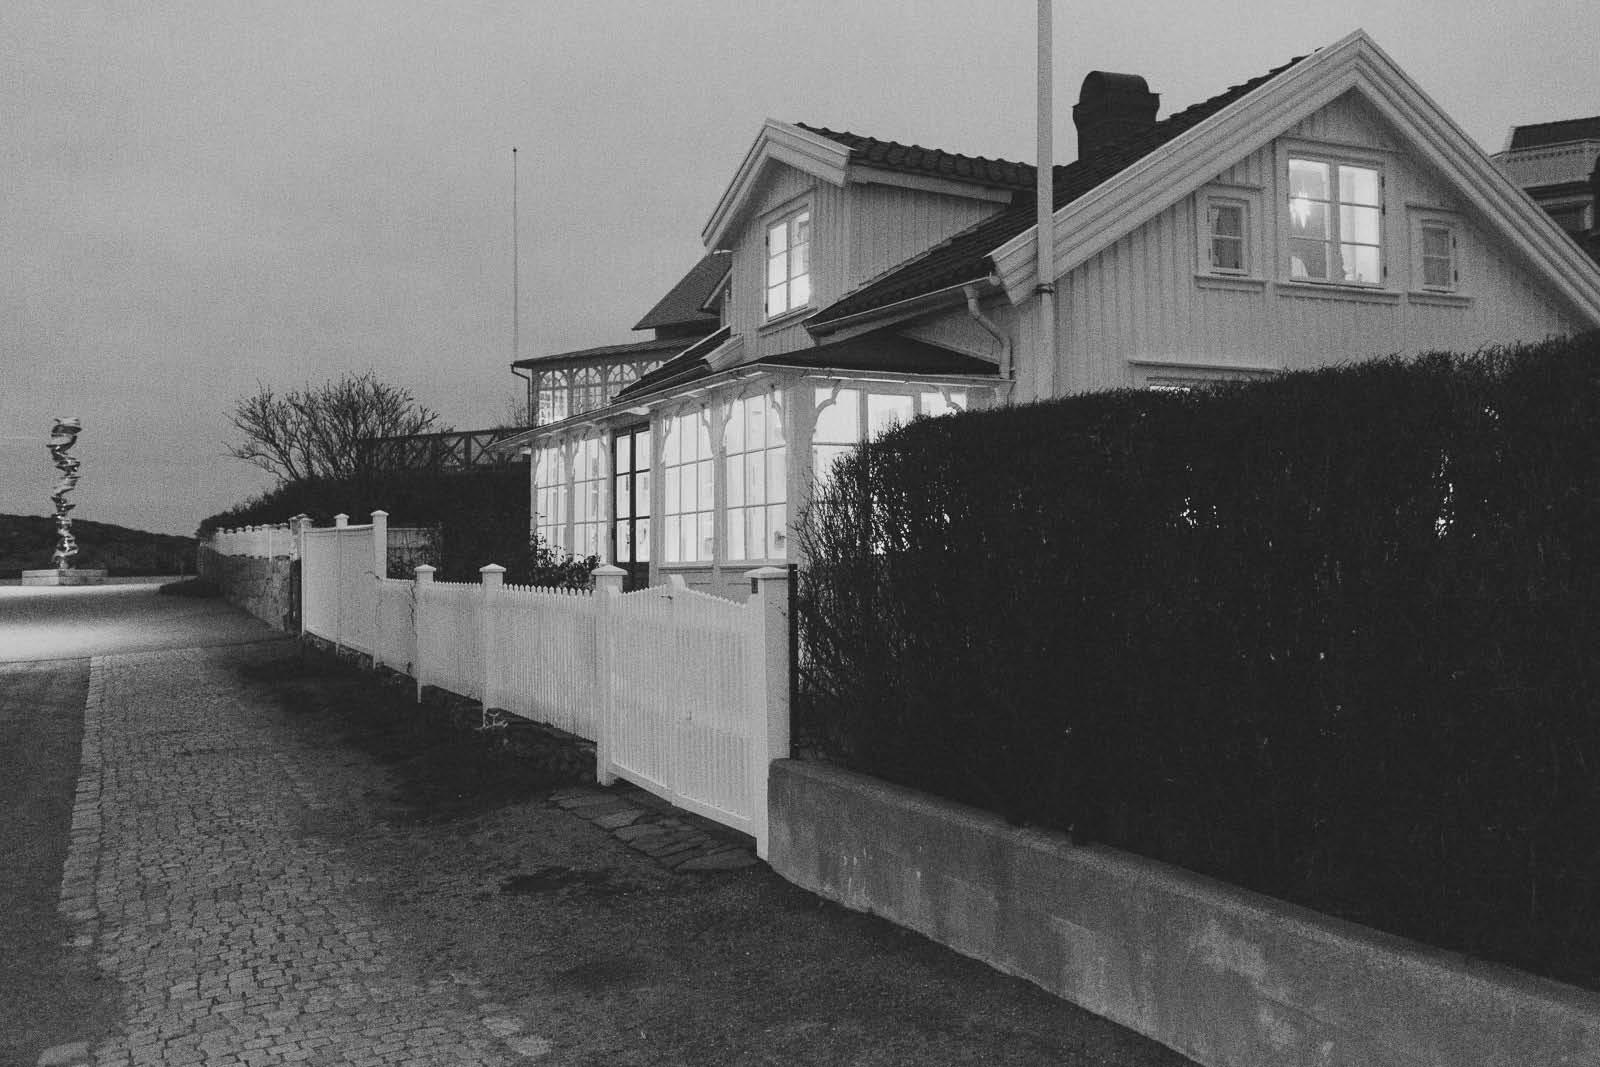 Sweden_roadtrip_Evabloem-0122.jpg